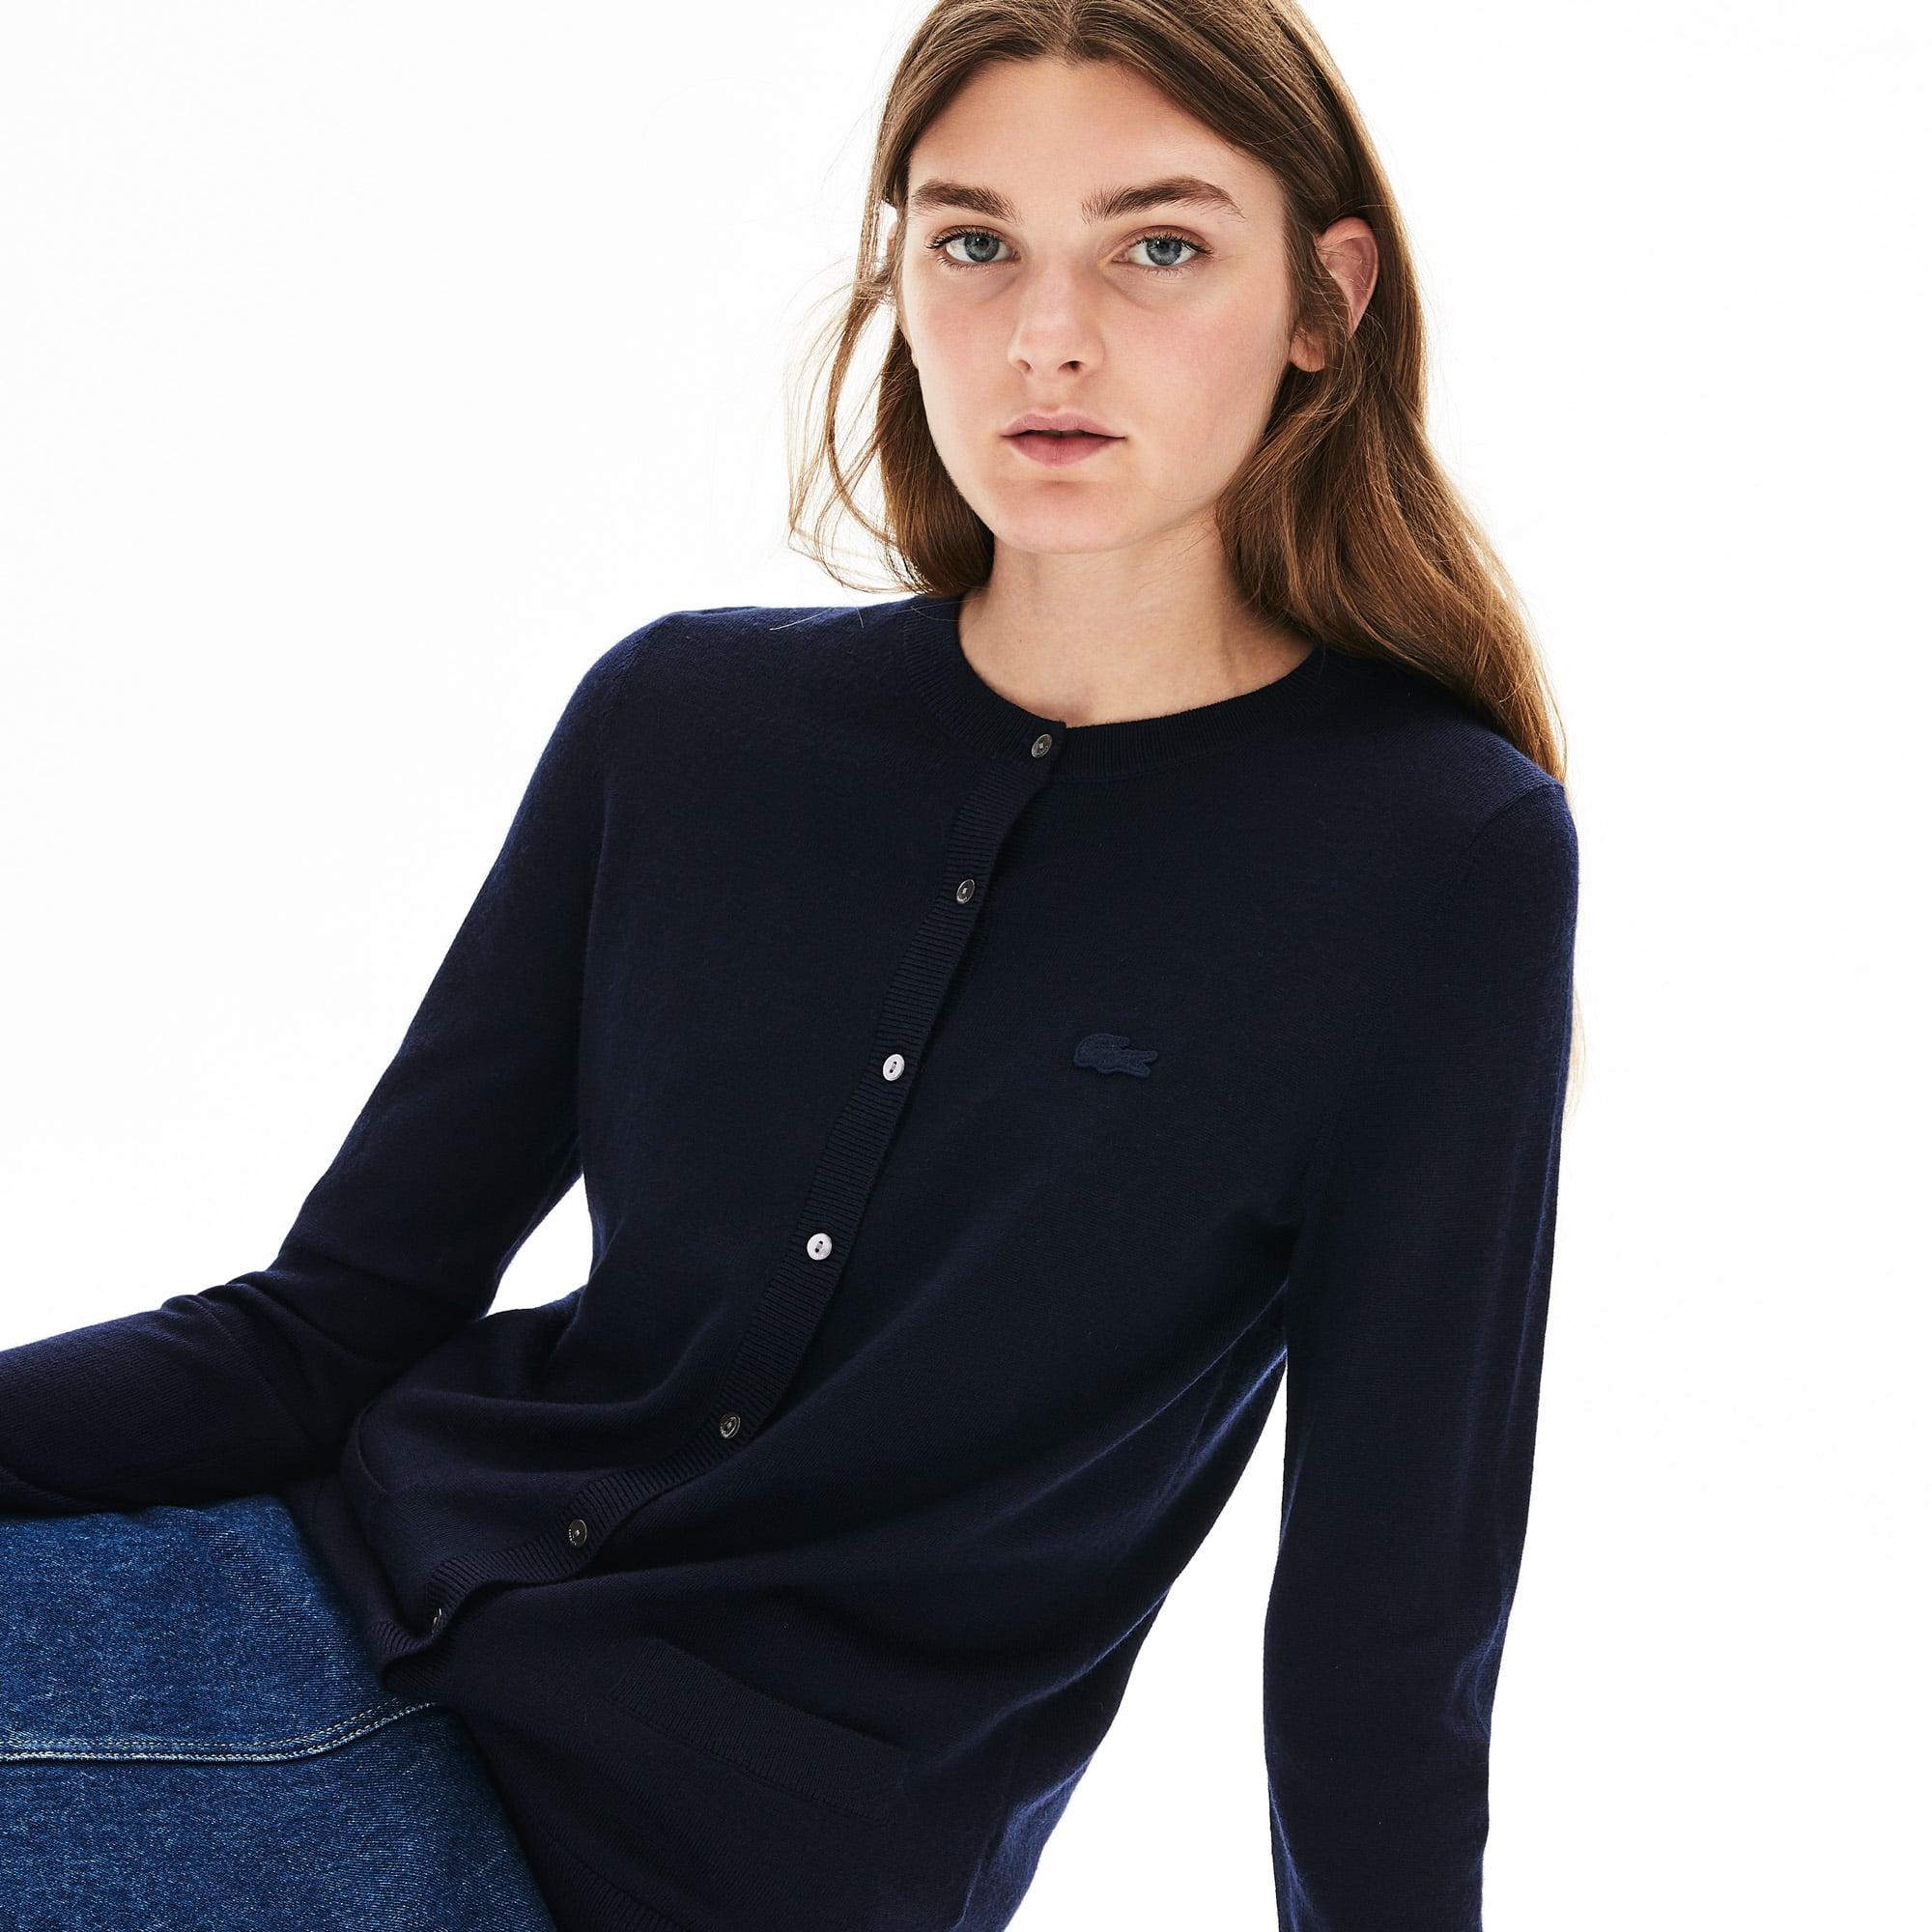 Women's Contrast Edge Wool Cardigan